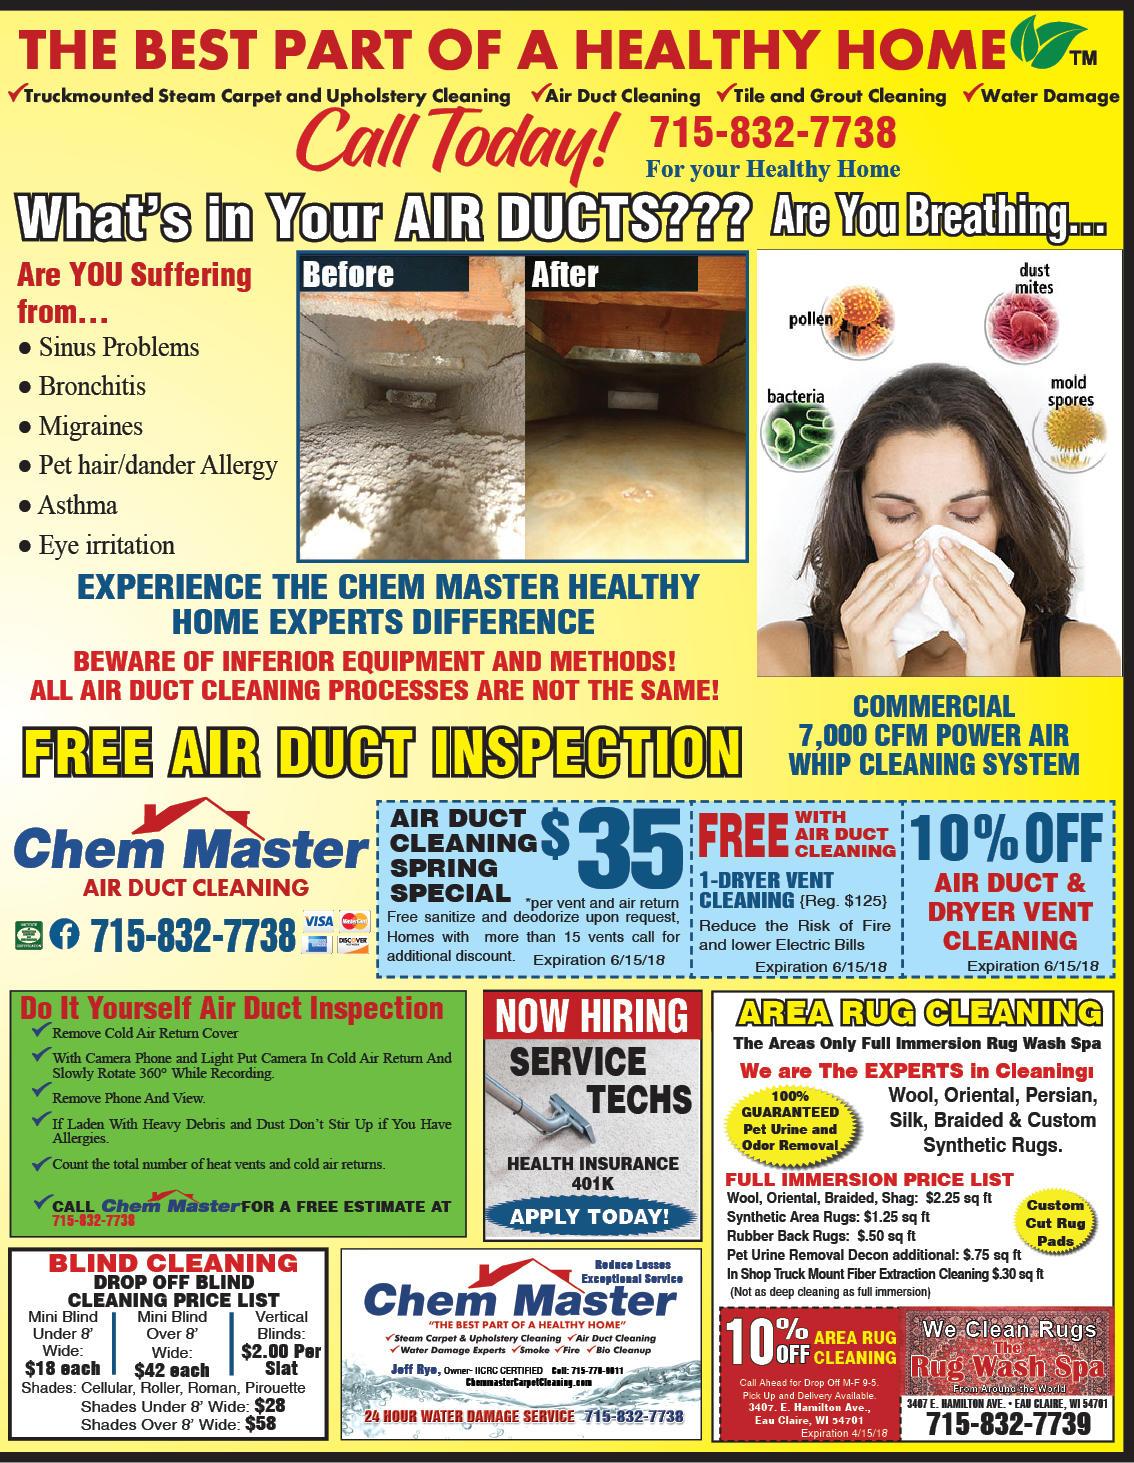 Chem Master Carpet Cleaning And Restoration image 12